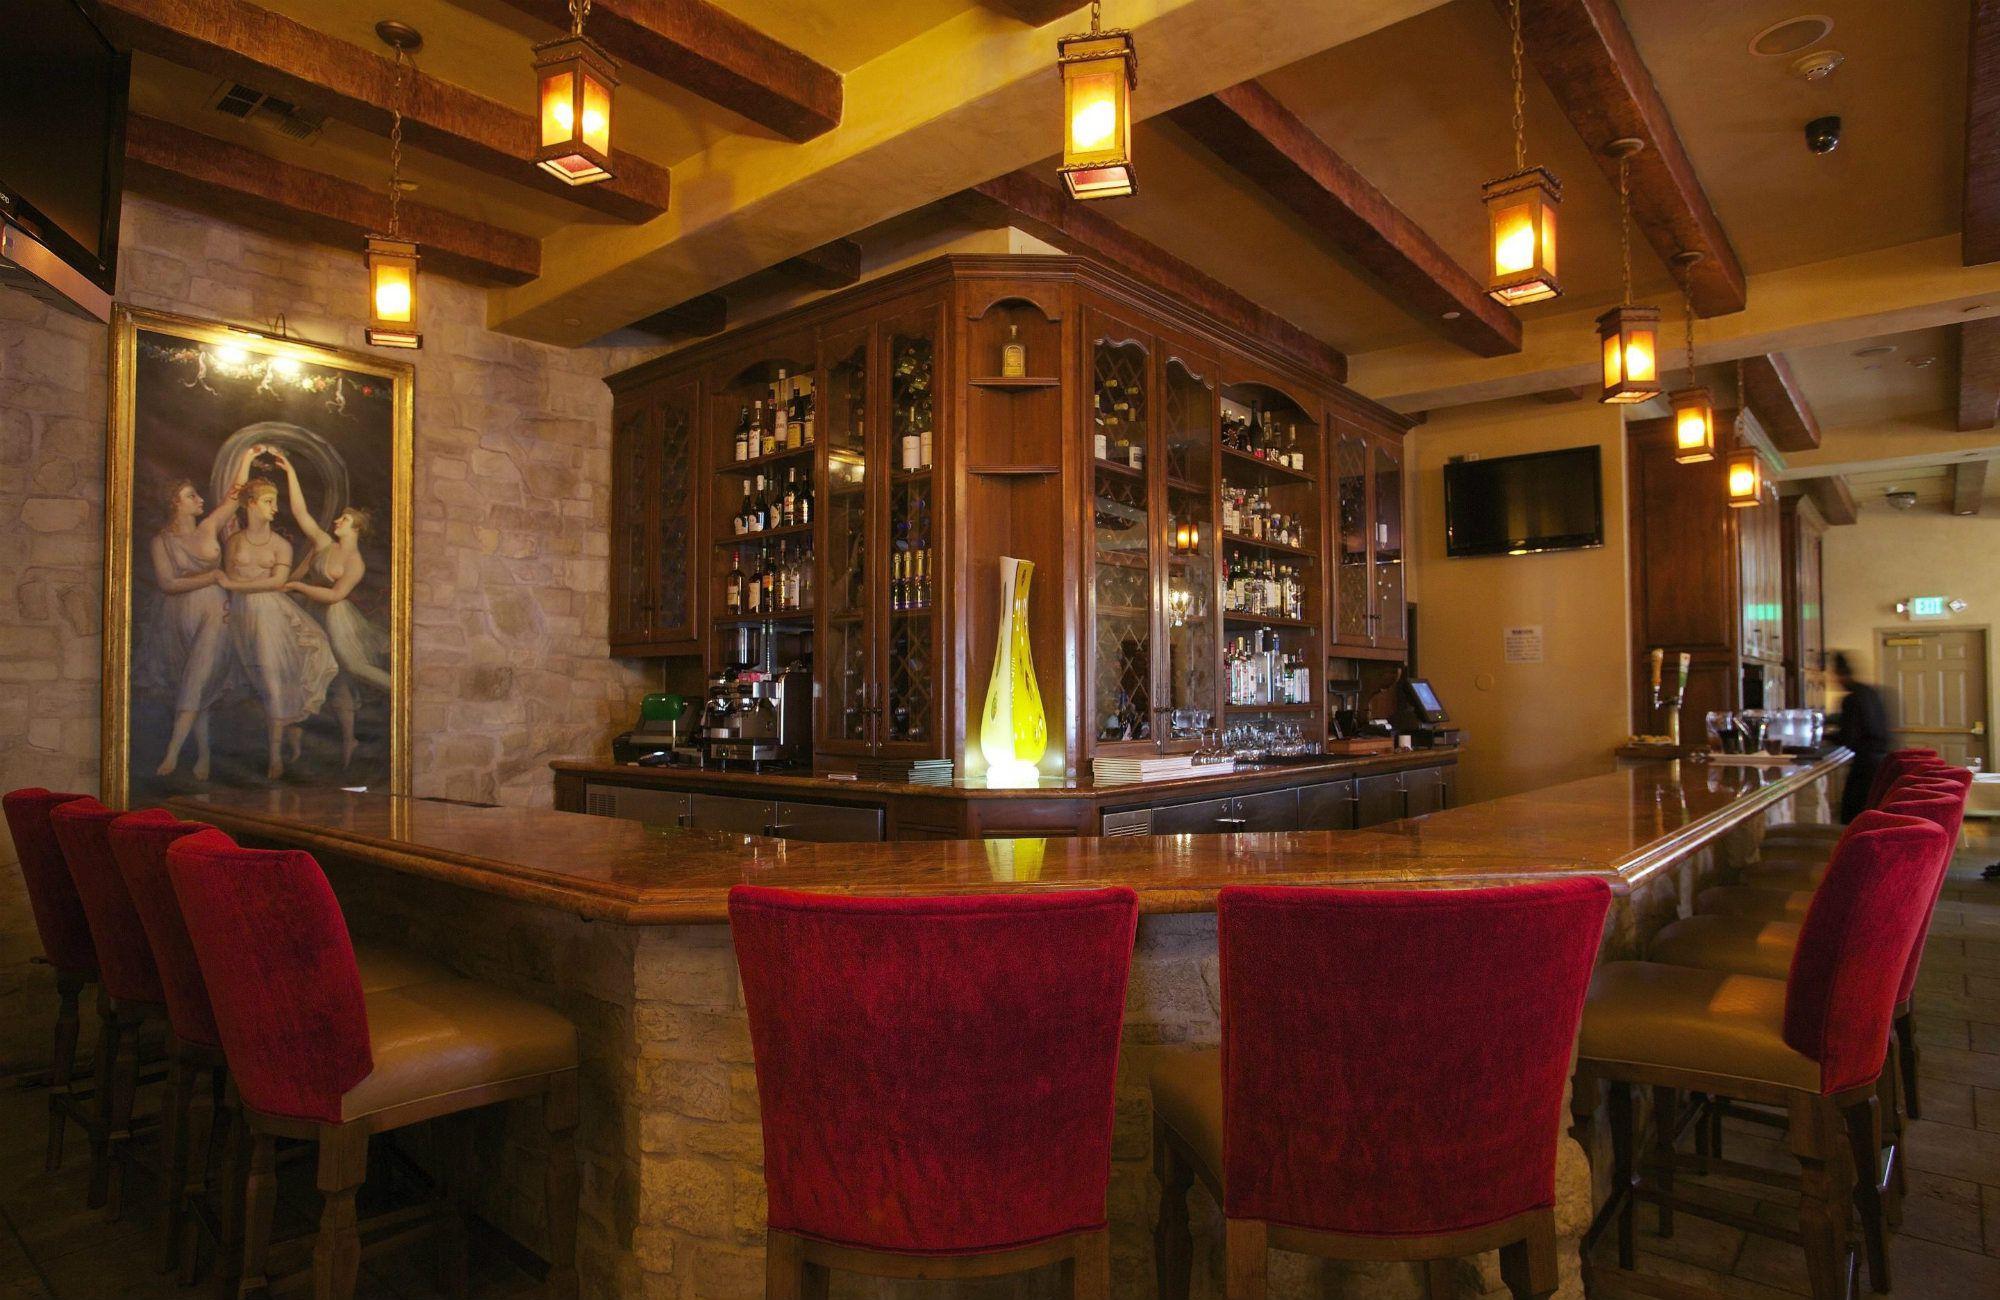 Dinner Menu Selection Matisse Restaurant - Table 41 restaurant